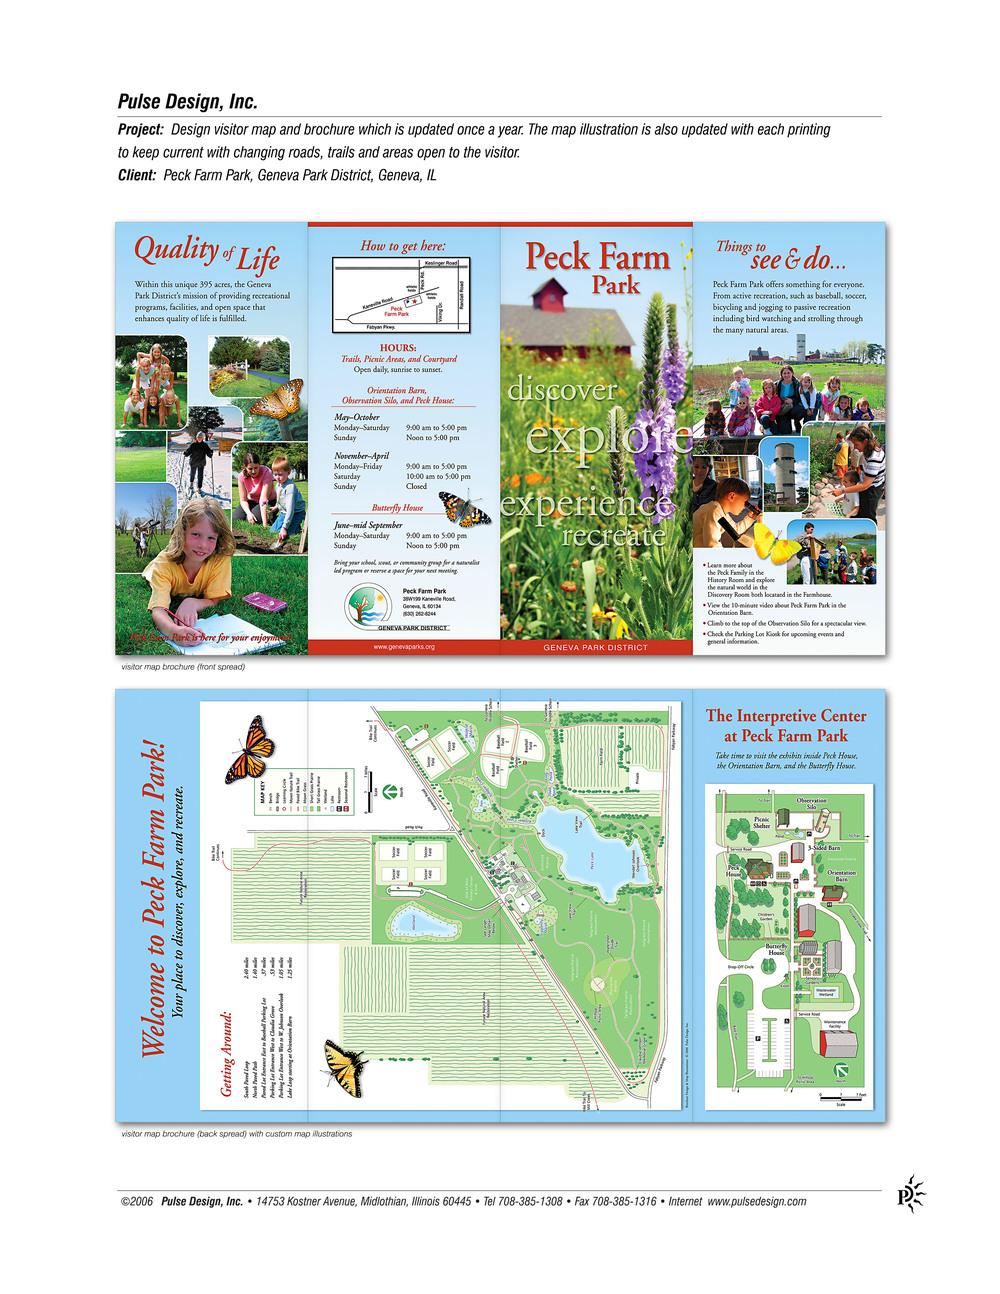 Peck-Farm-Brochure-Map-2-Pulse-Design-Inc.jpg